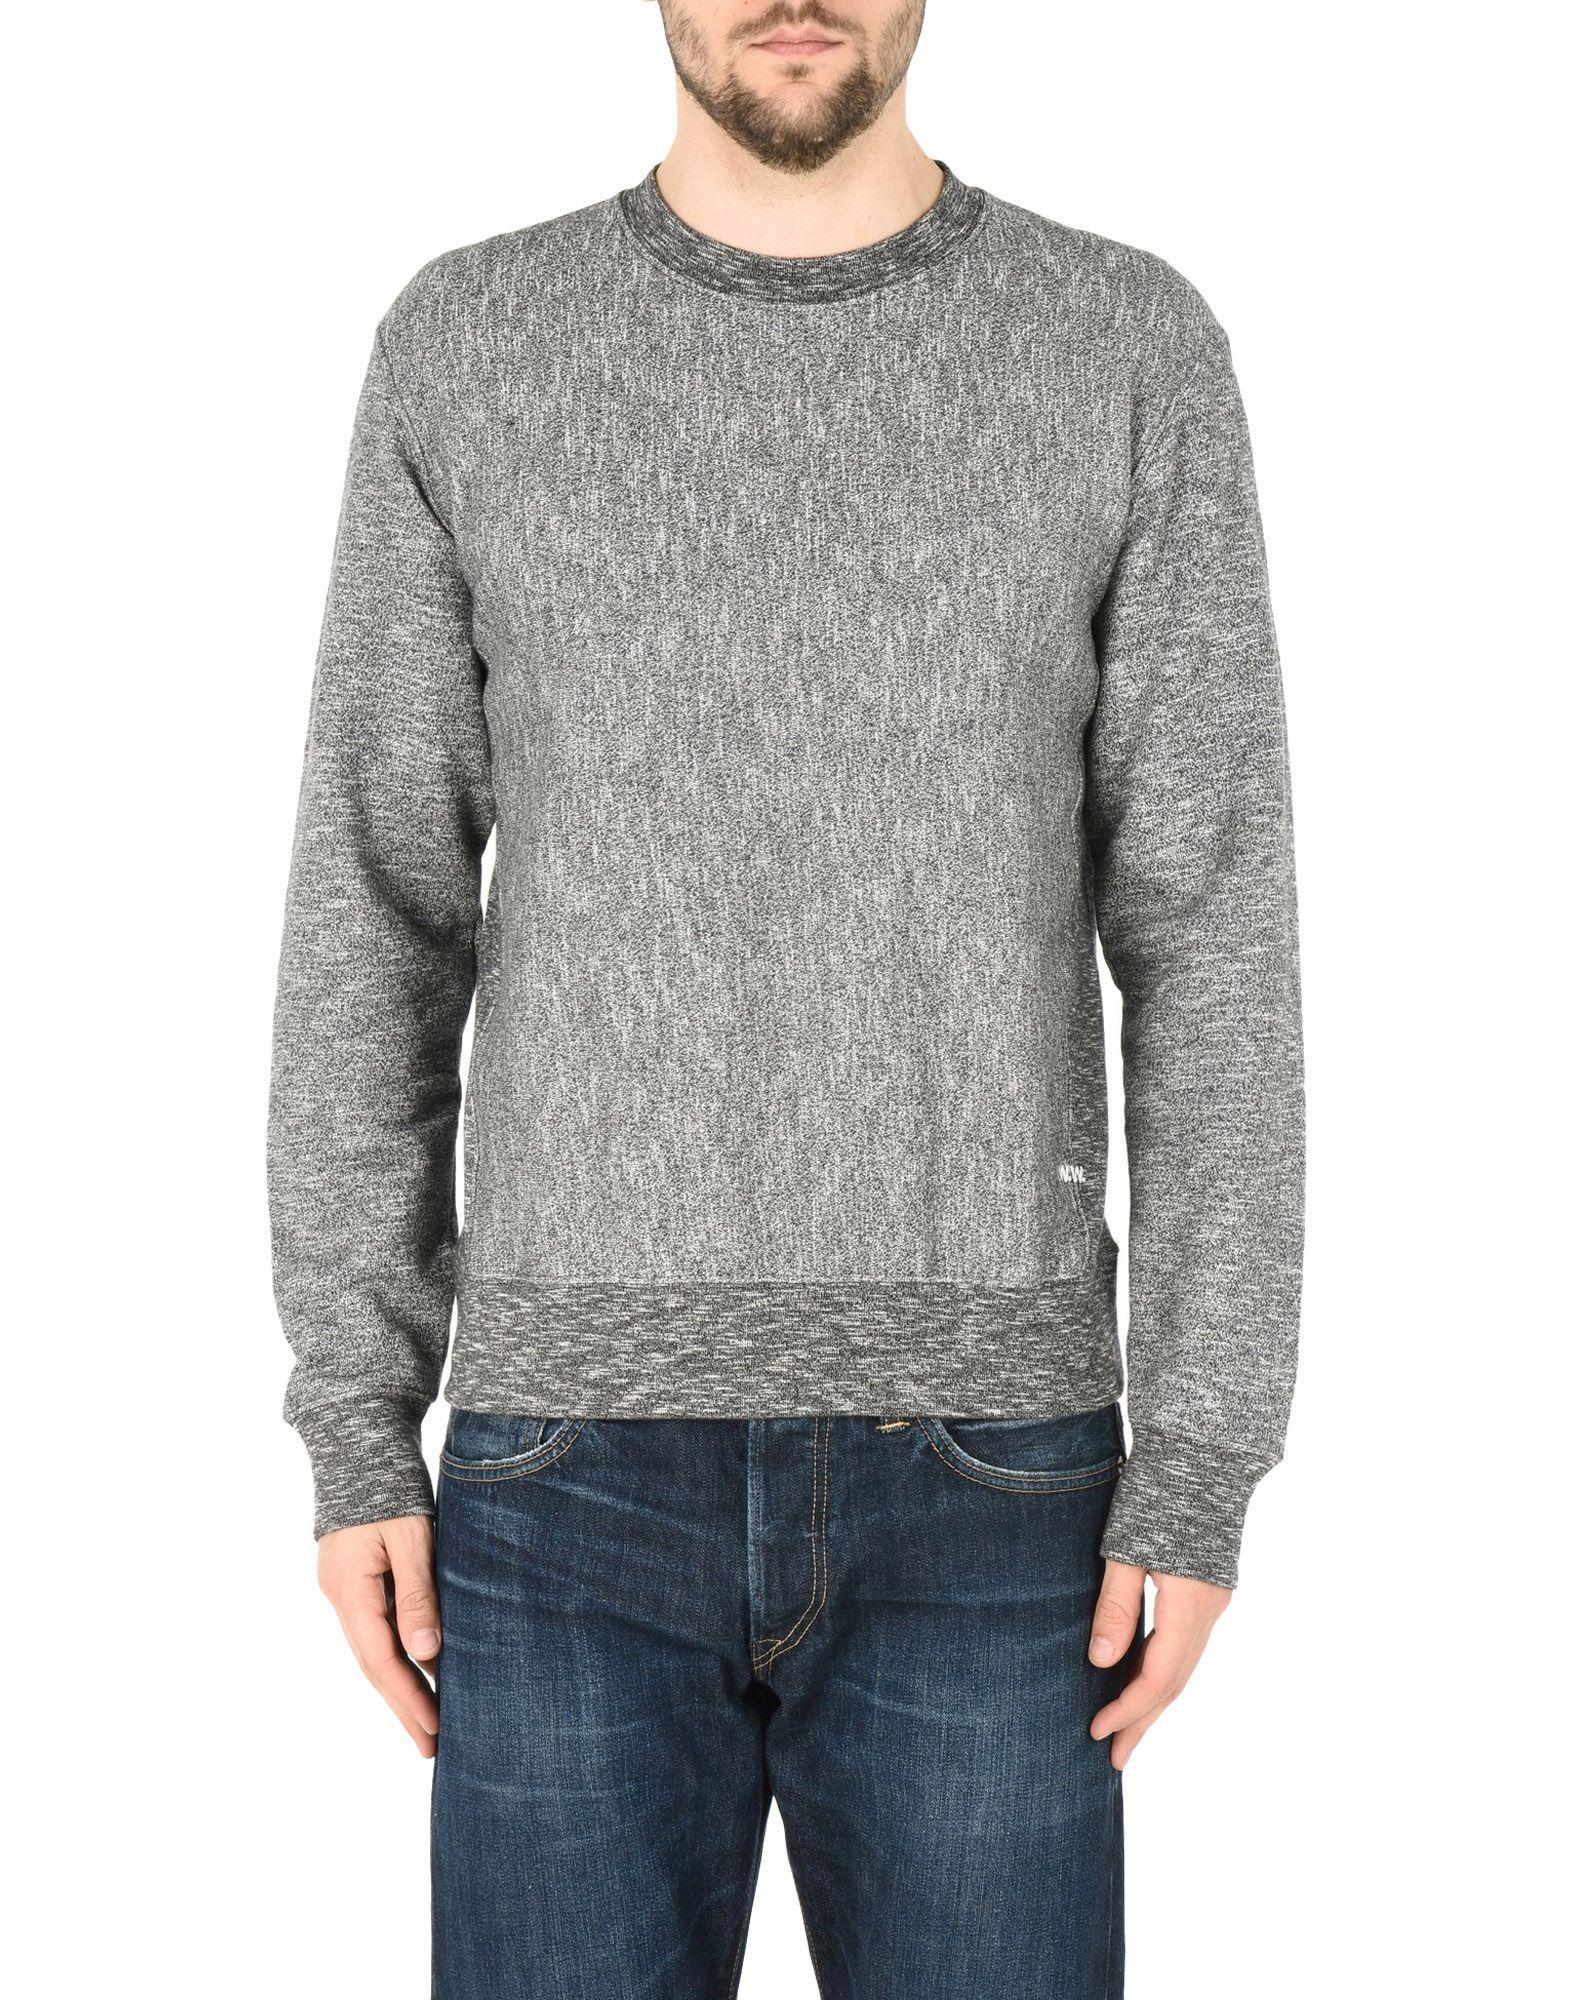 Wood Wood Black Cotton Sweatshirt